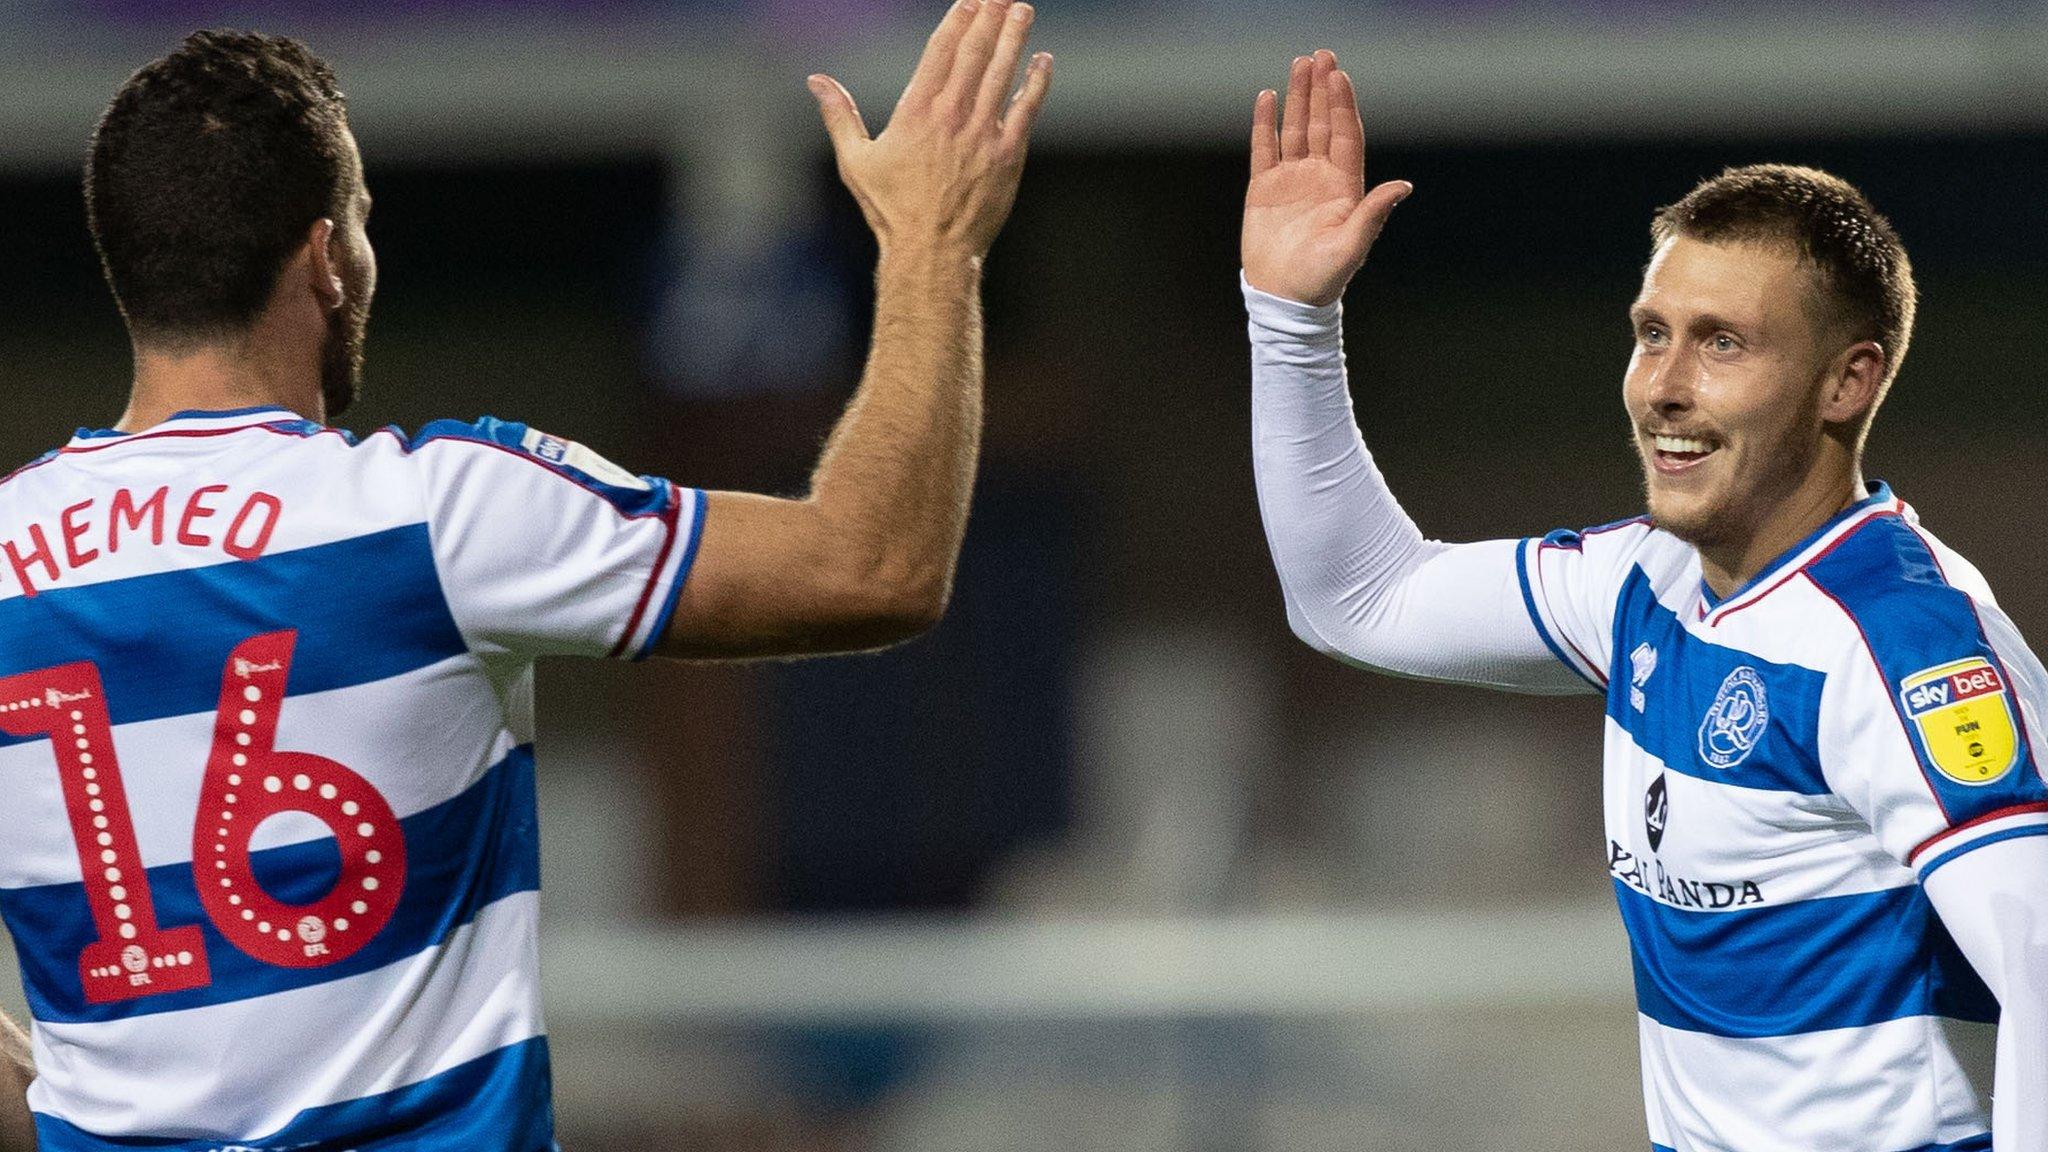 Queens Park Rangers 3-0 Sheffield Wednesday: Rangers win third match in four